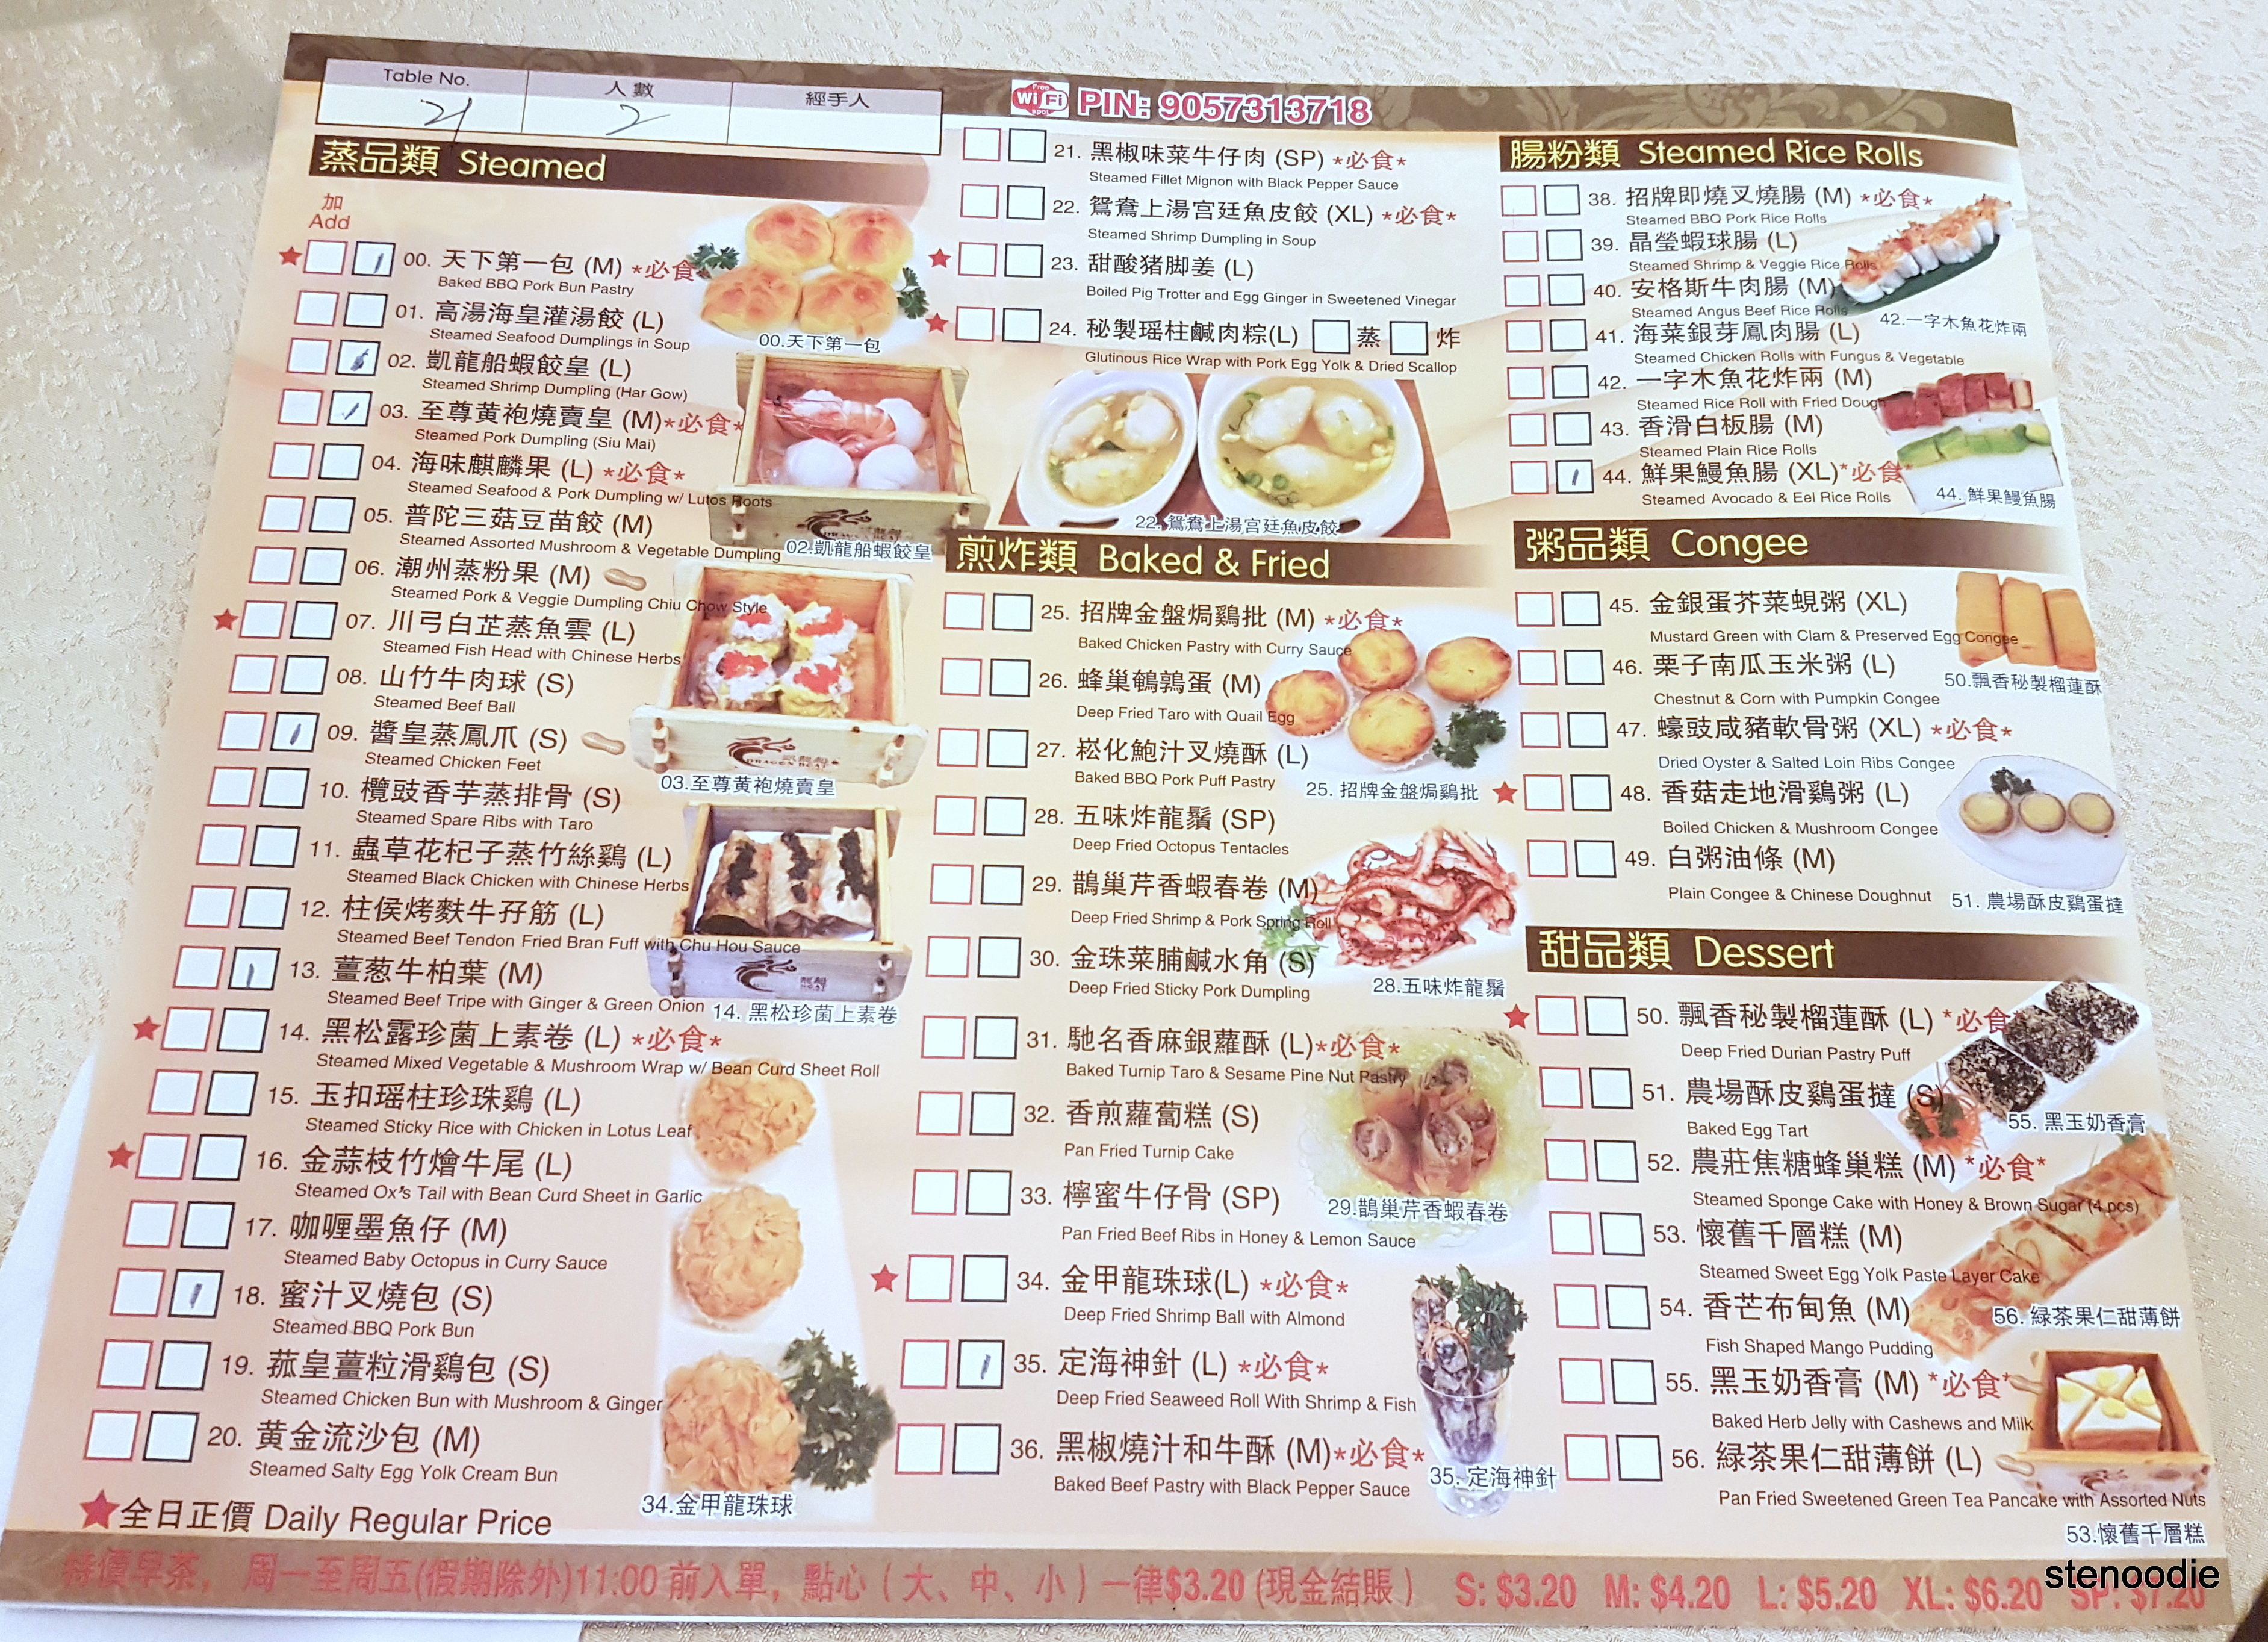 Dragon Boat Fusion Cuisine dim sum order sheet